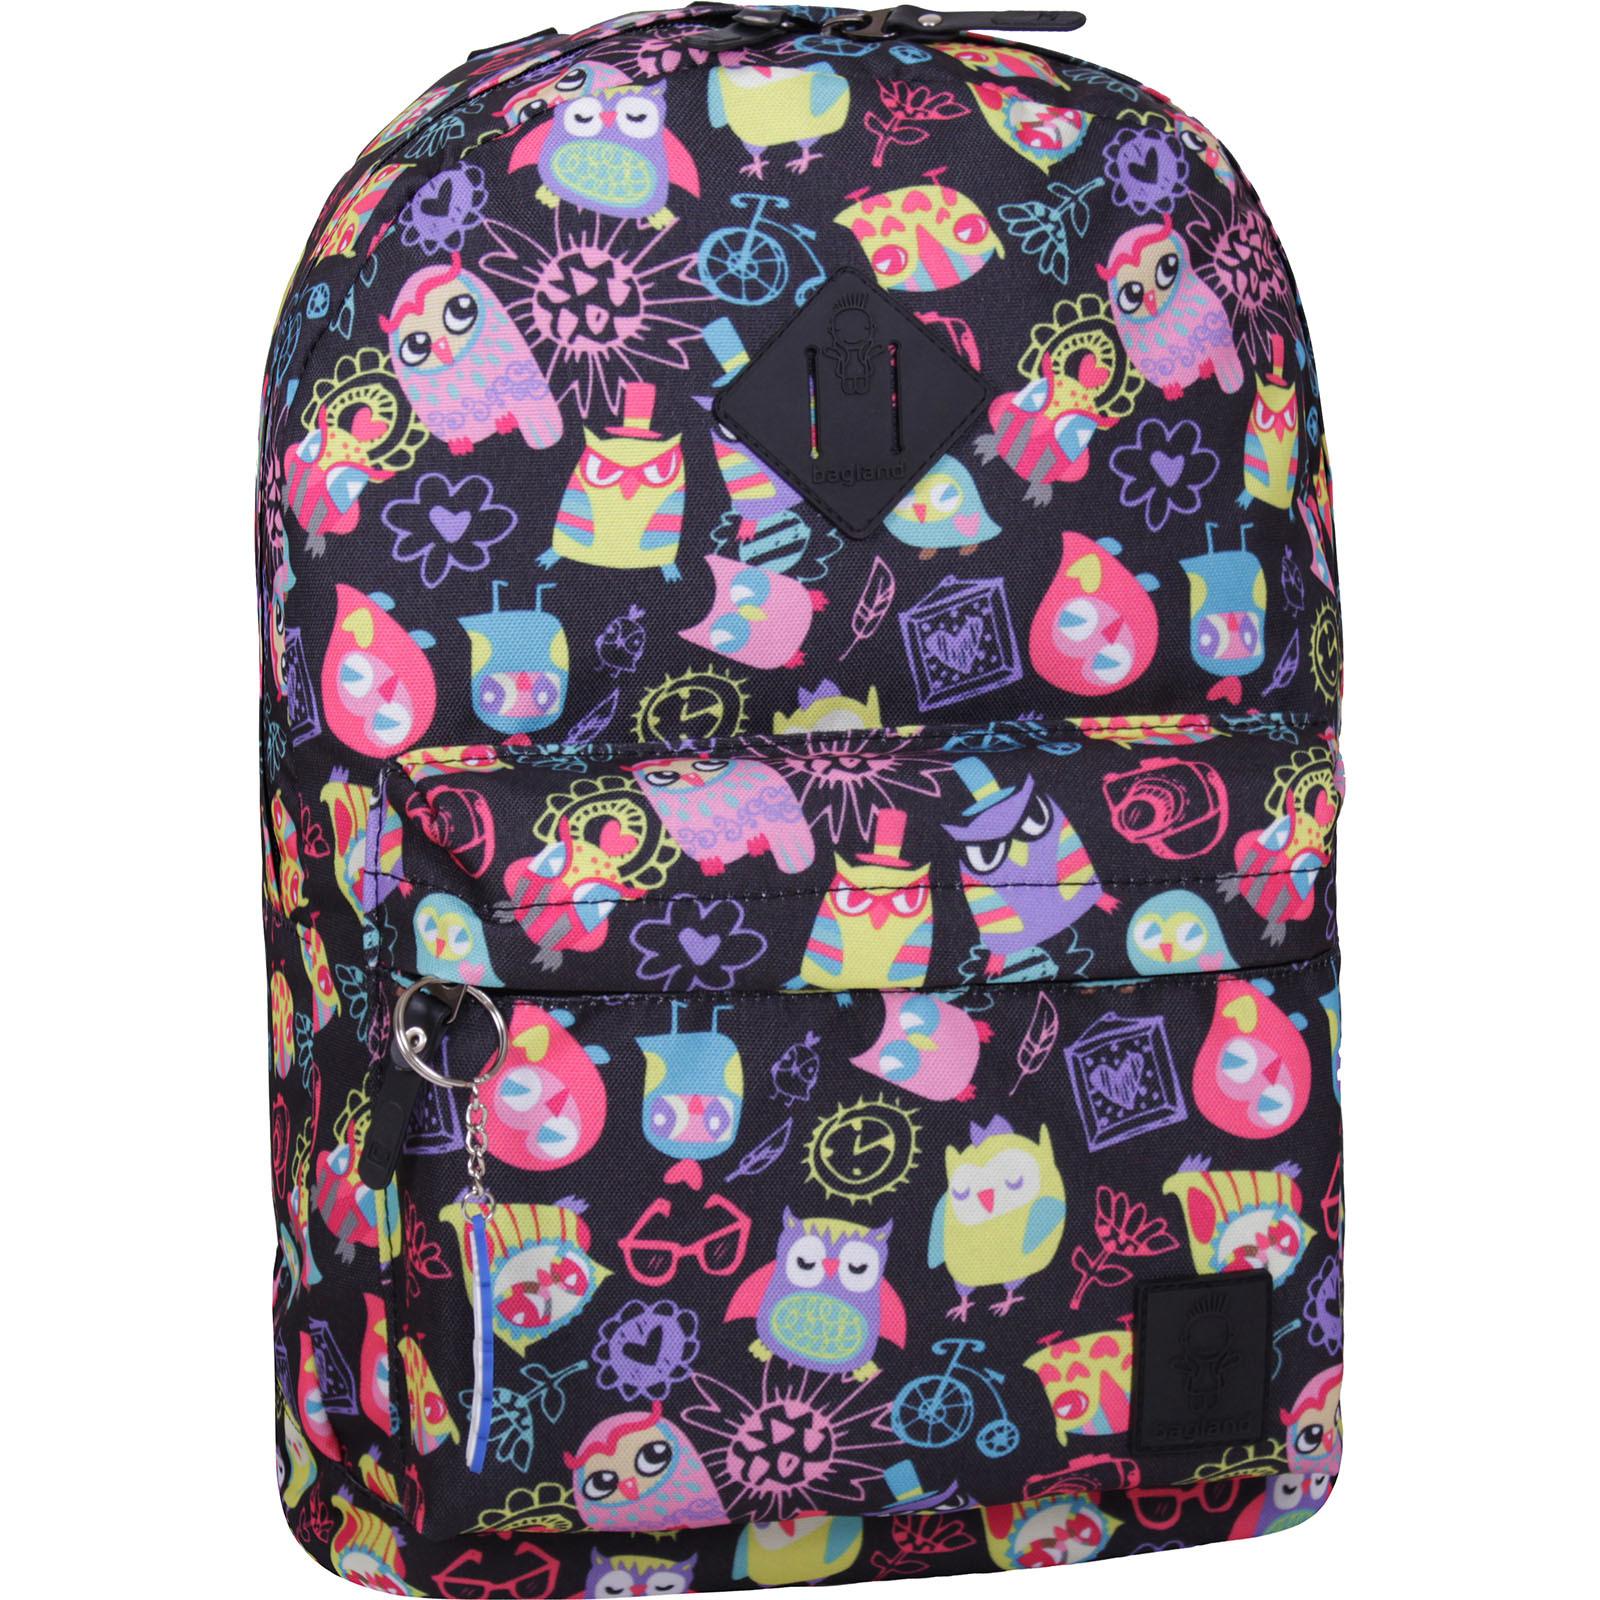 Городские рюкзаки Рюкзак Bagland Молодежный (дизайн) 17 л. сублимация (45) (00533664) IMG_3719.JPG